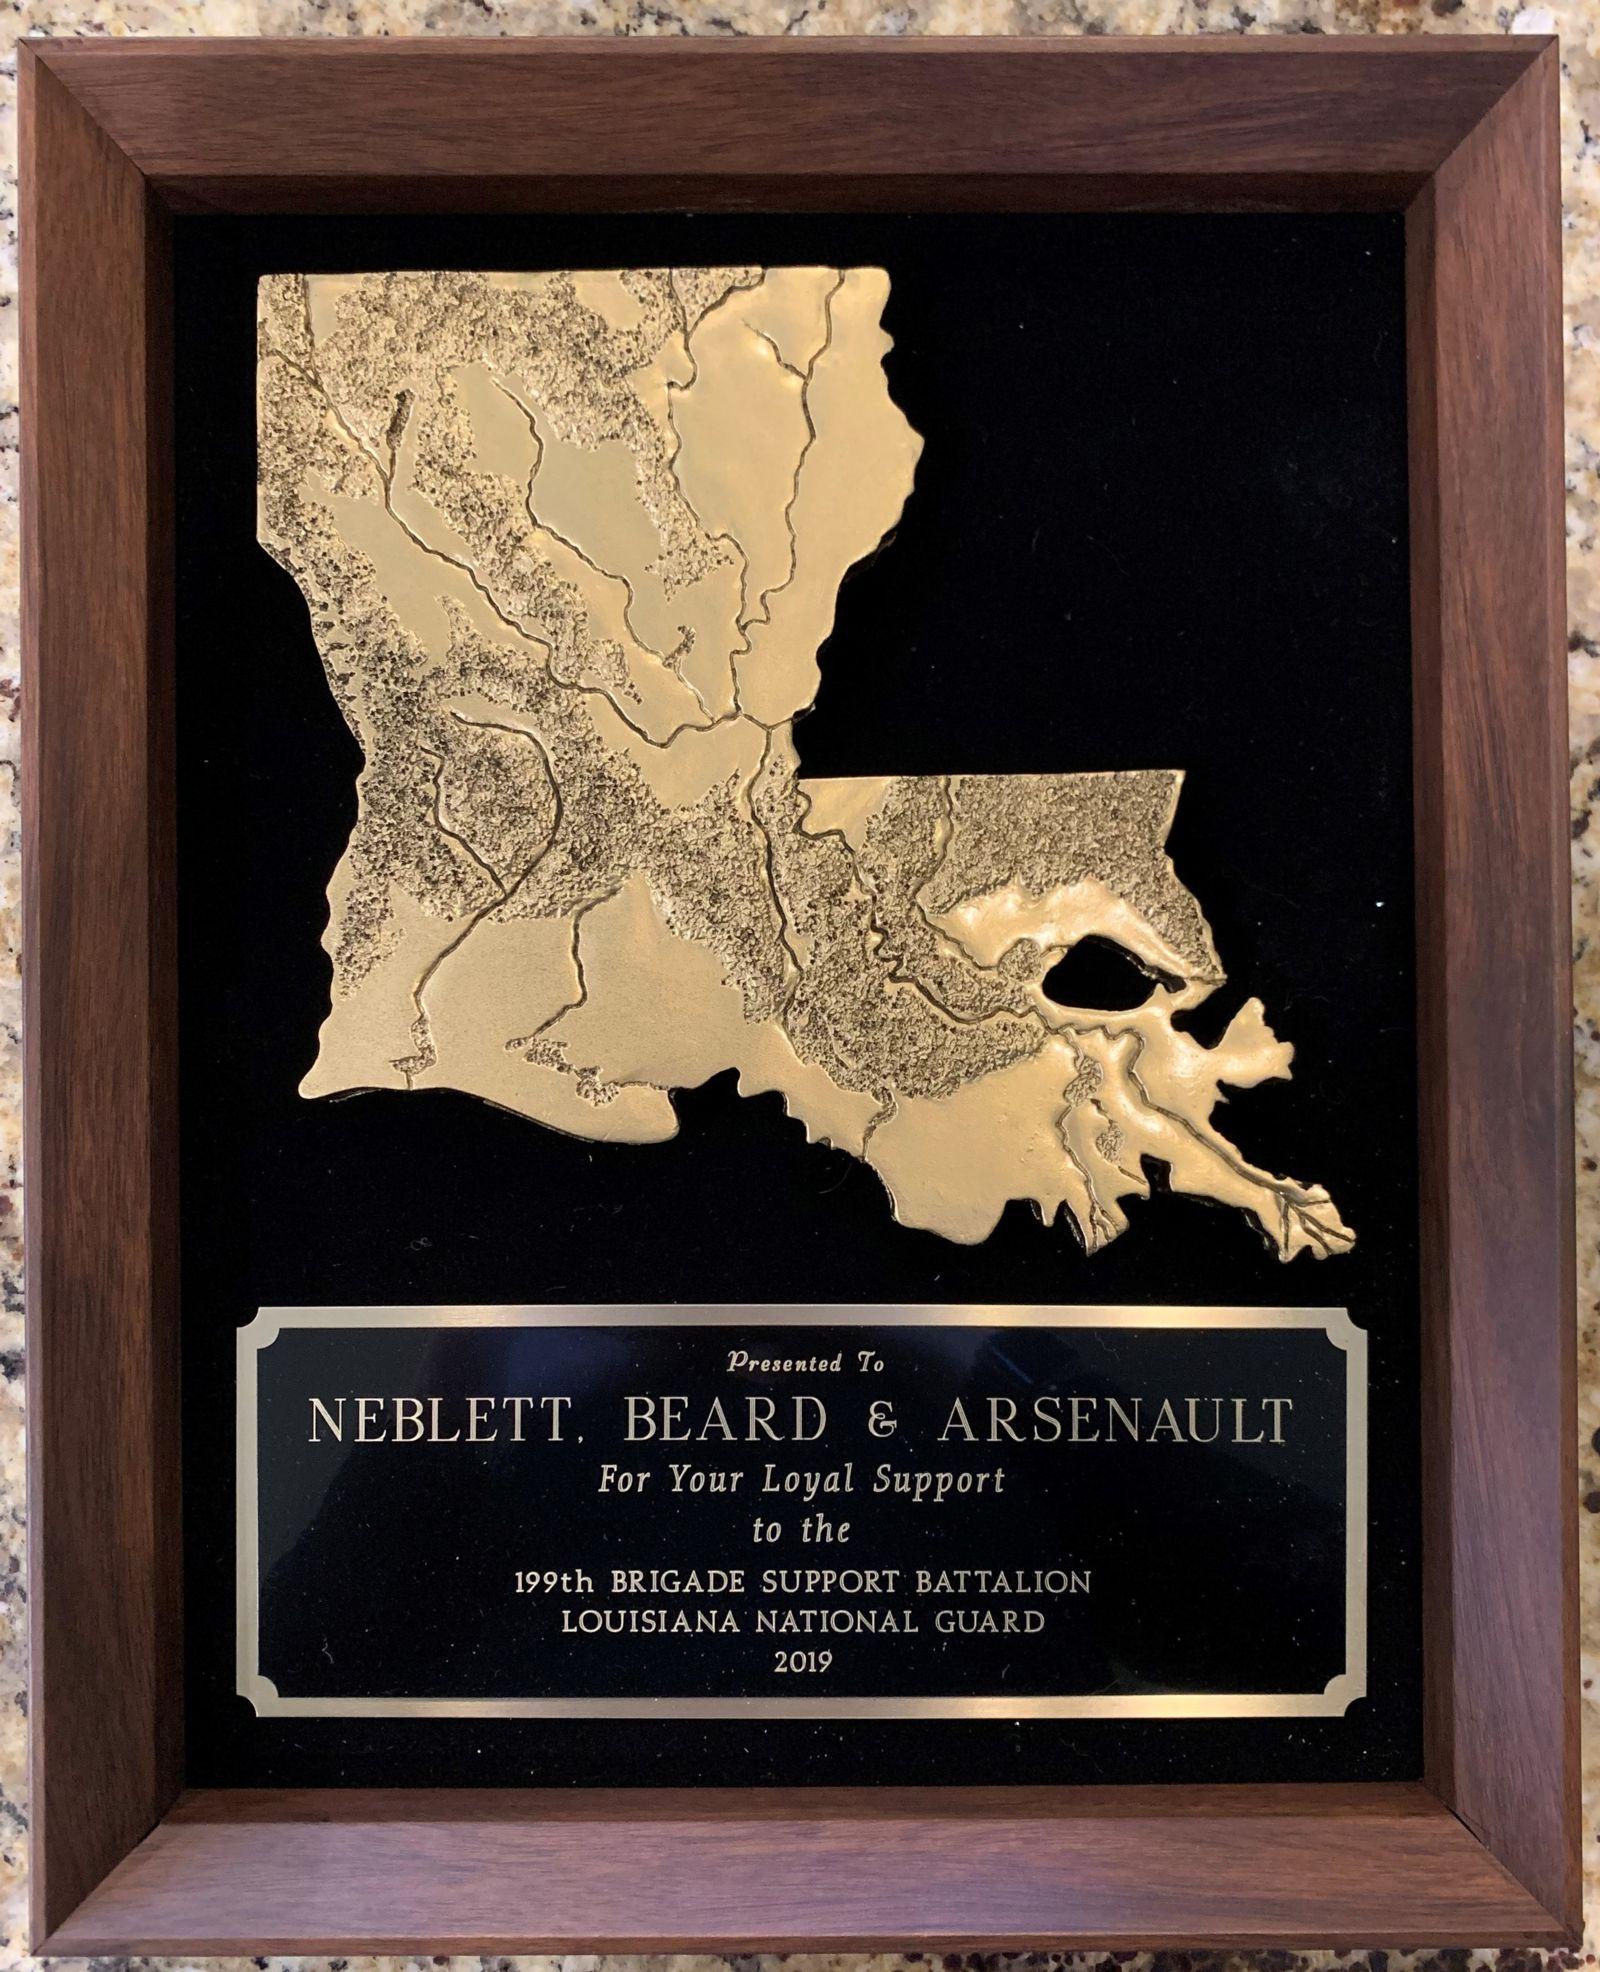 Neblett Beard and Arsenault